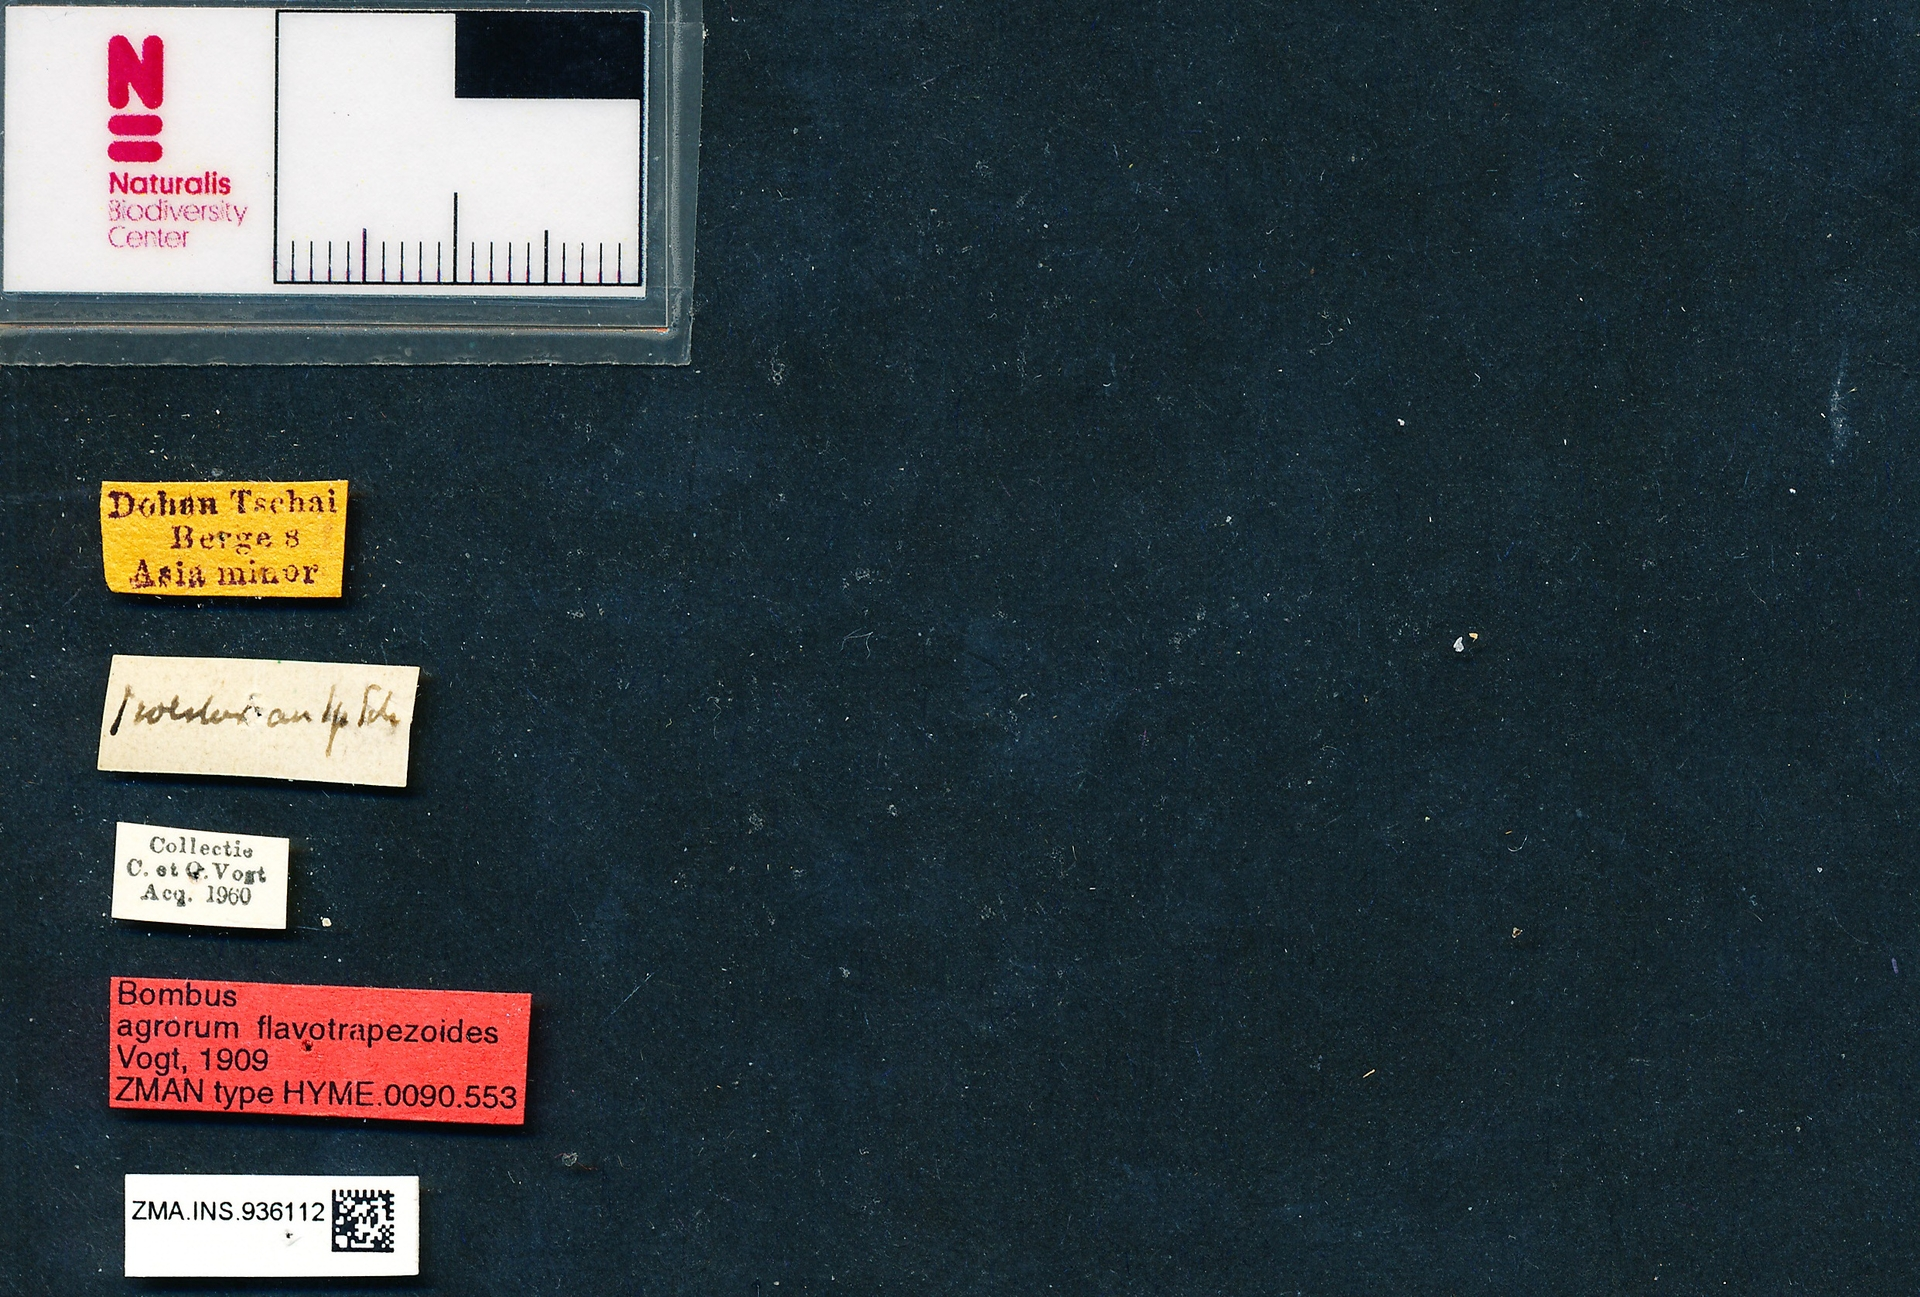 ZMA.INS.936112 | Bombus (Thoracobombus) pascuorum flavotrapezoides Vogt, 1909